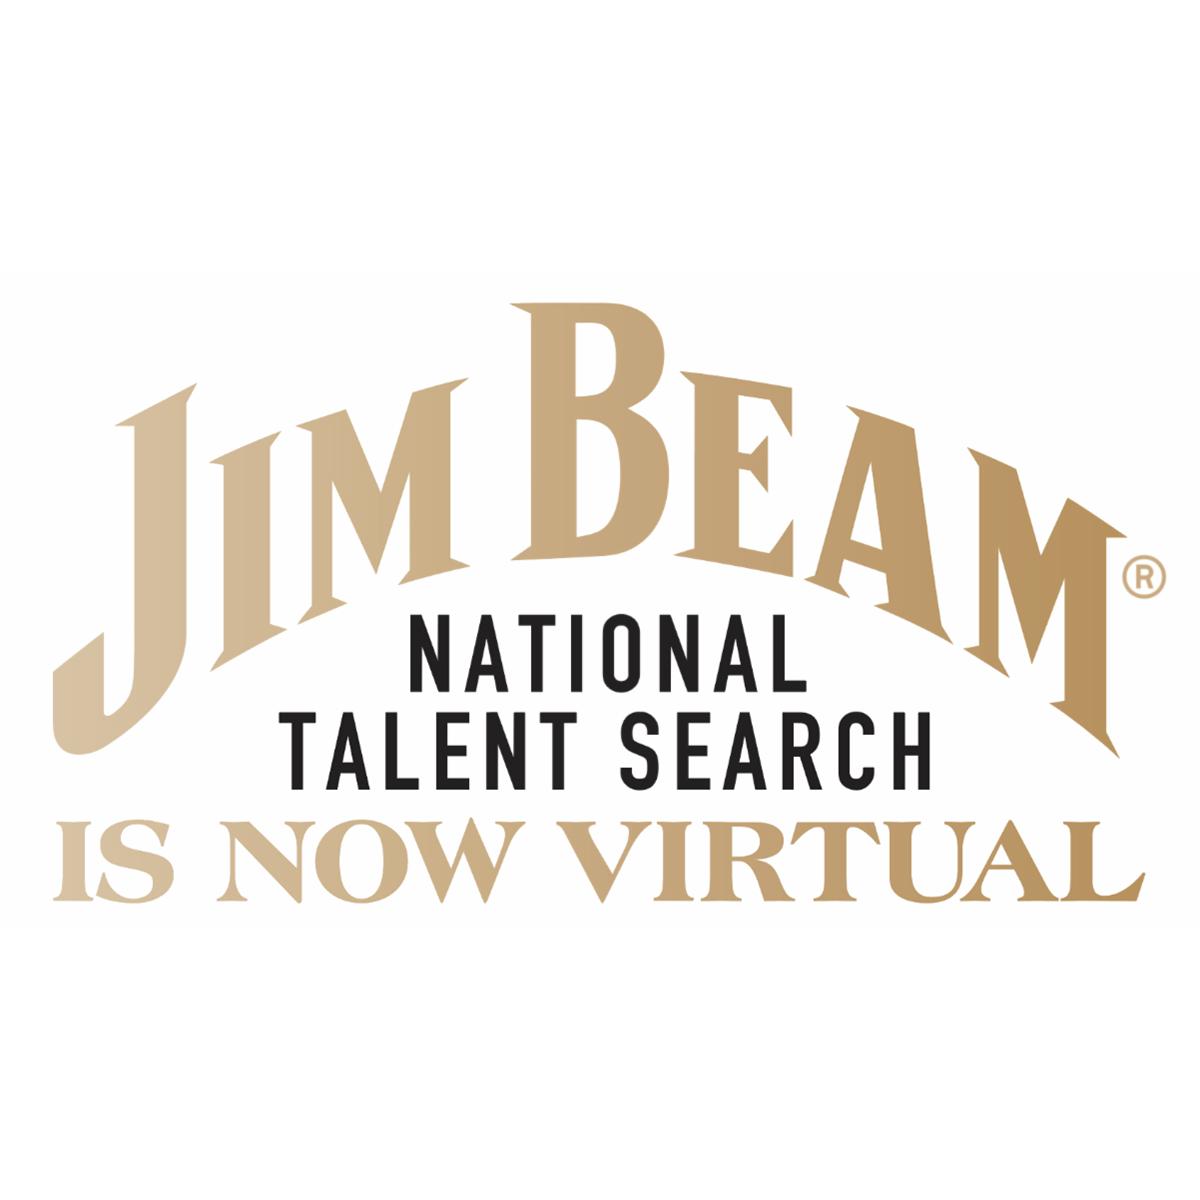 Meet your Jim Beam National Talent Search Regional Finalists!